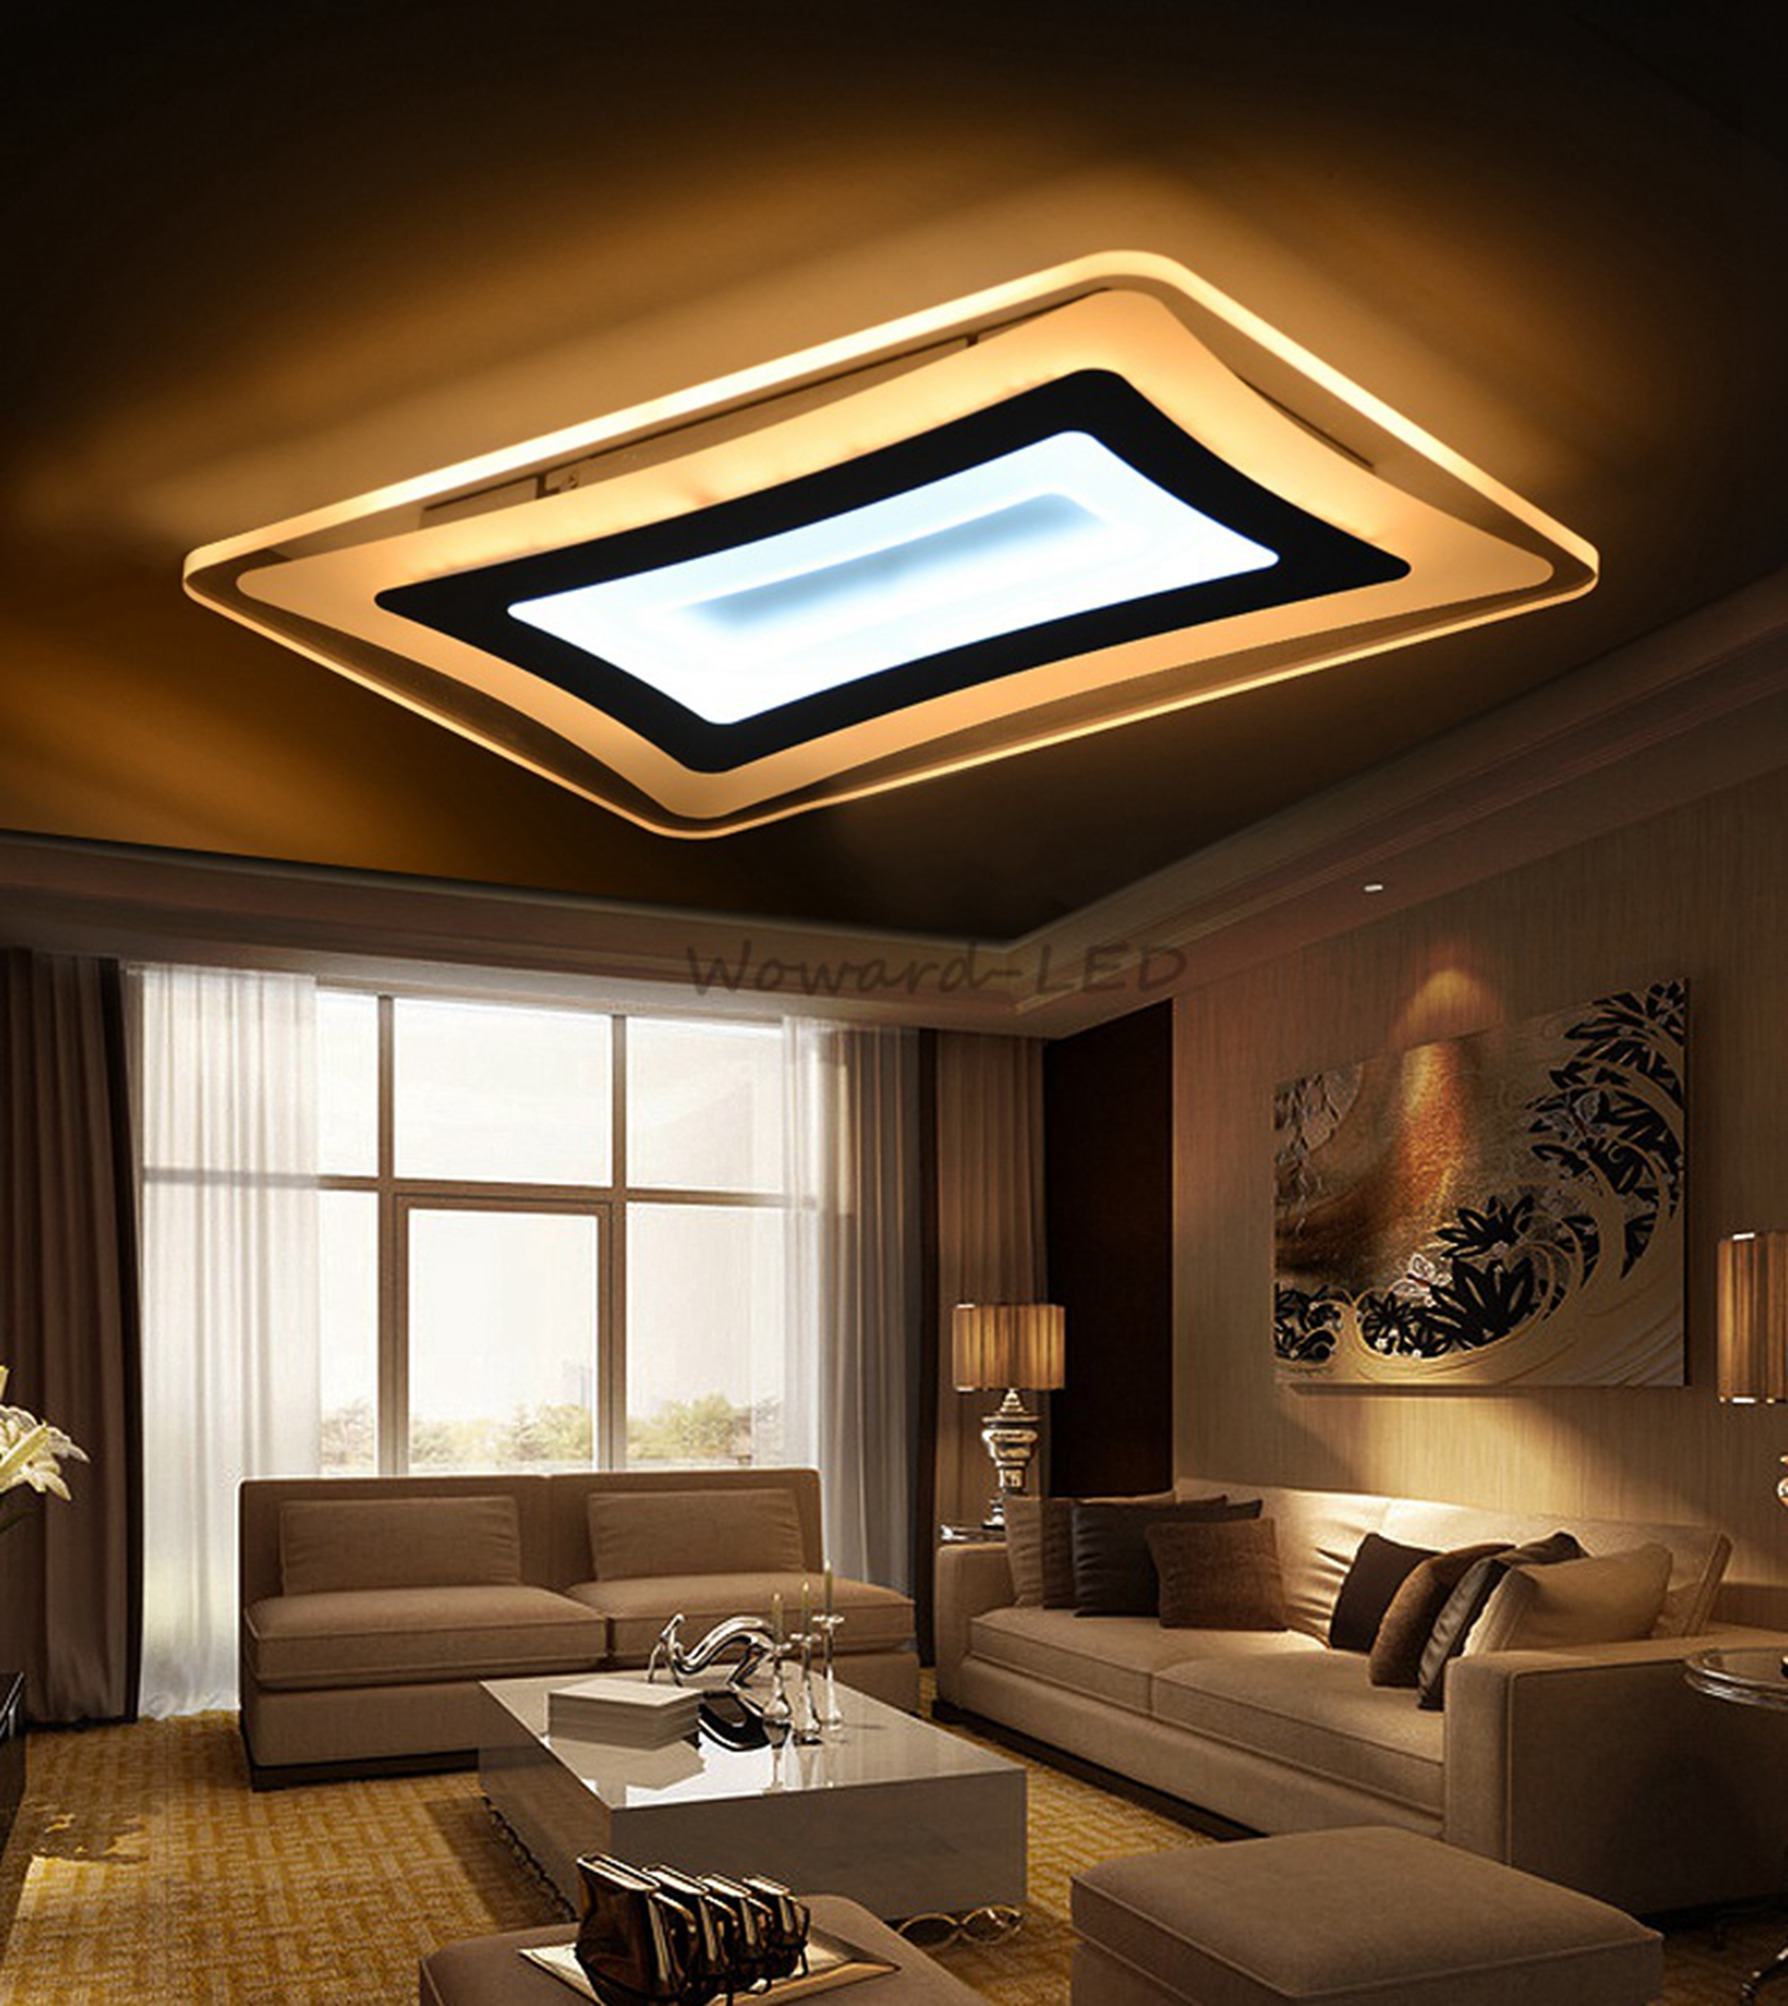 wow led deckenlampe deckenleuchte 48w bis 148w dimmbar lampe beleuchtung wow r b ebay. Black Bedroom Furniture Sets. Home Design Ideas